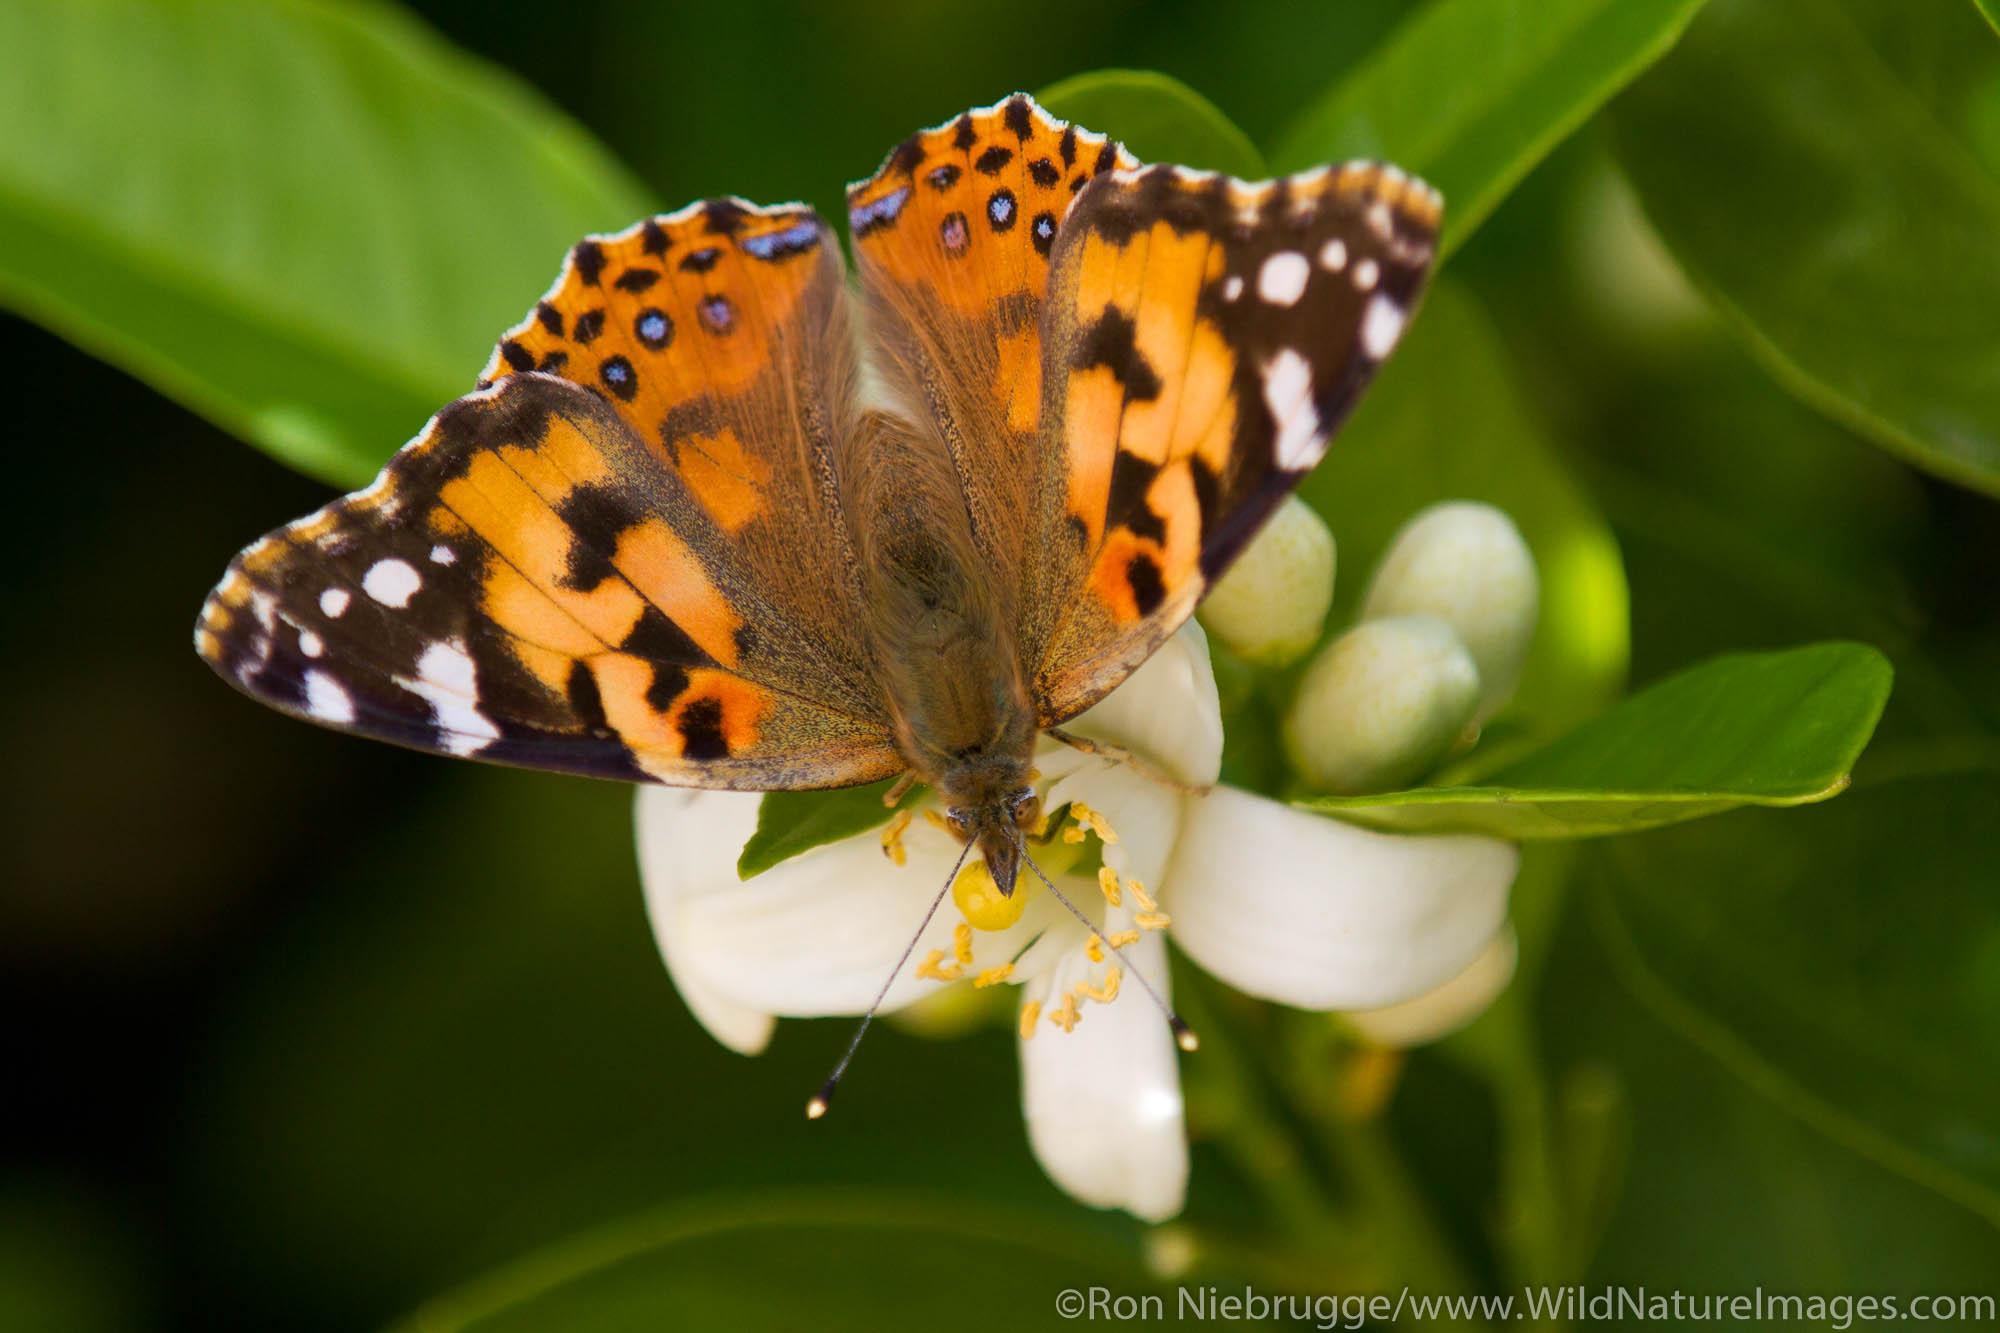 Moth, Anza-Borrego Desert State Park, California.